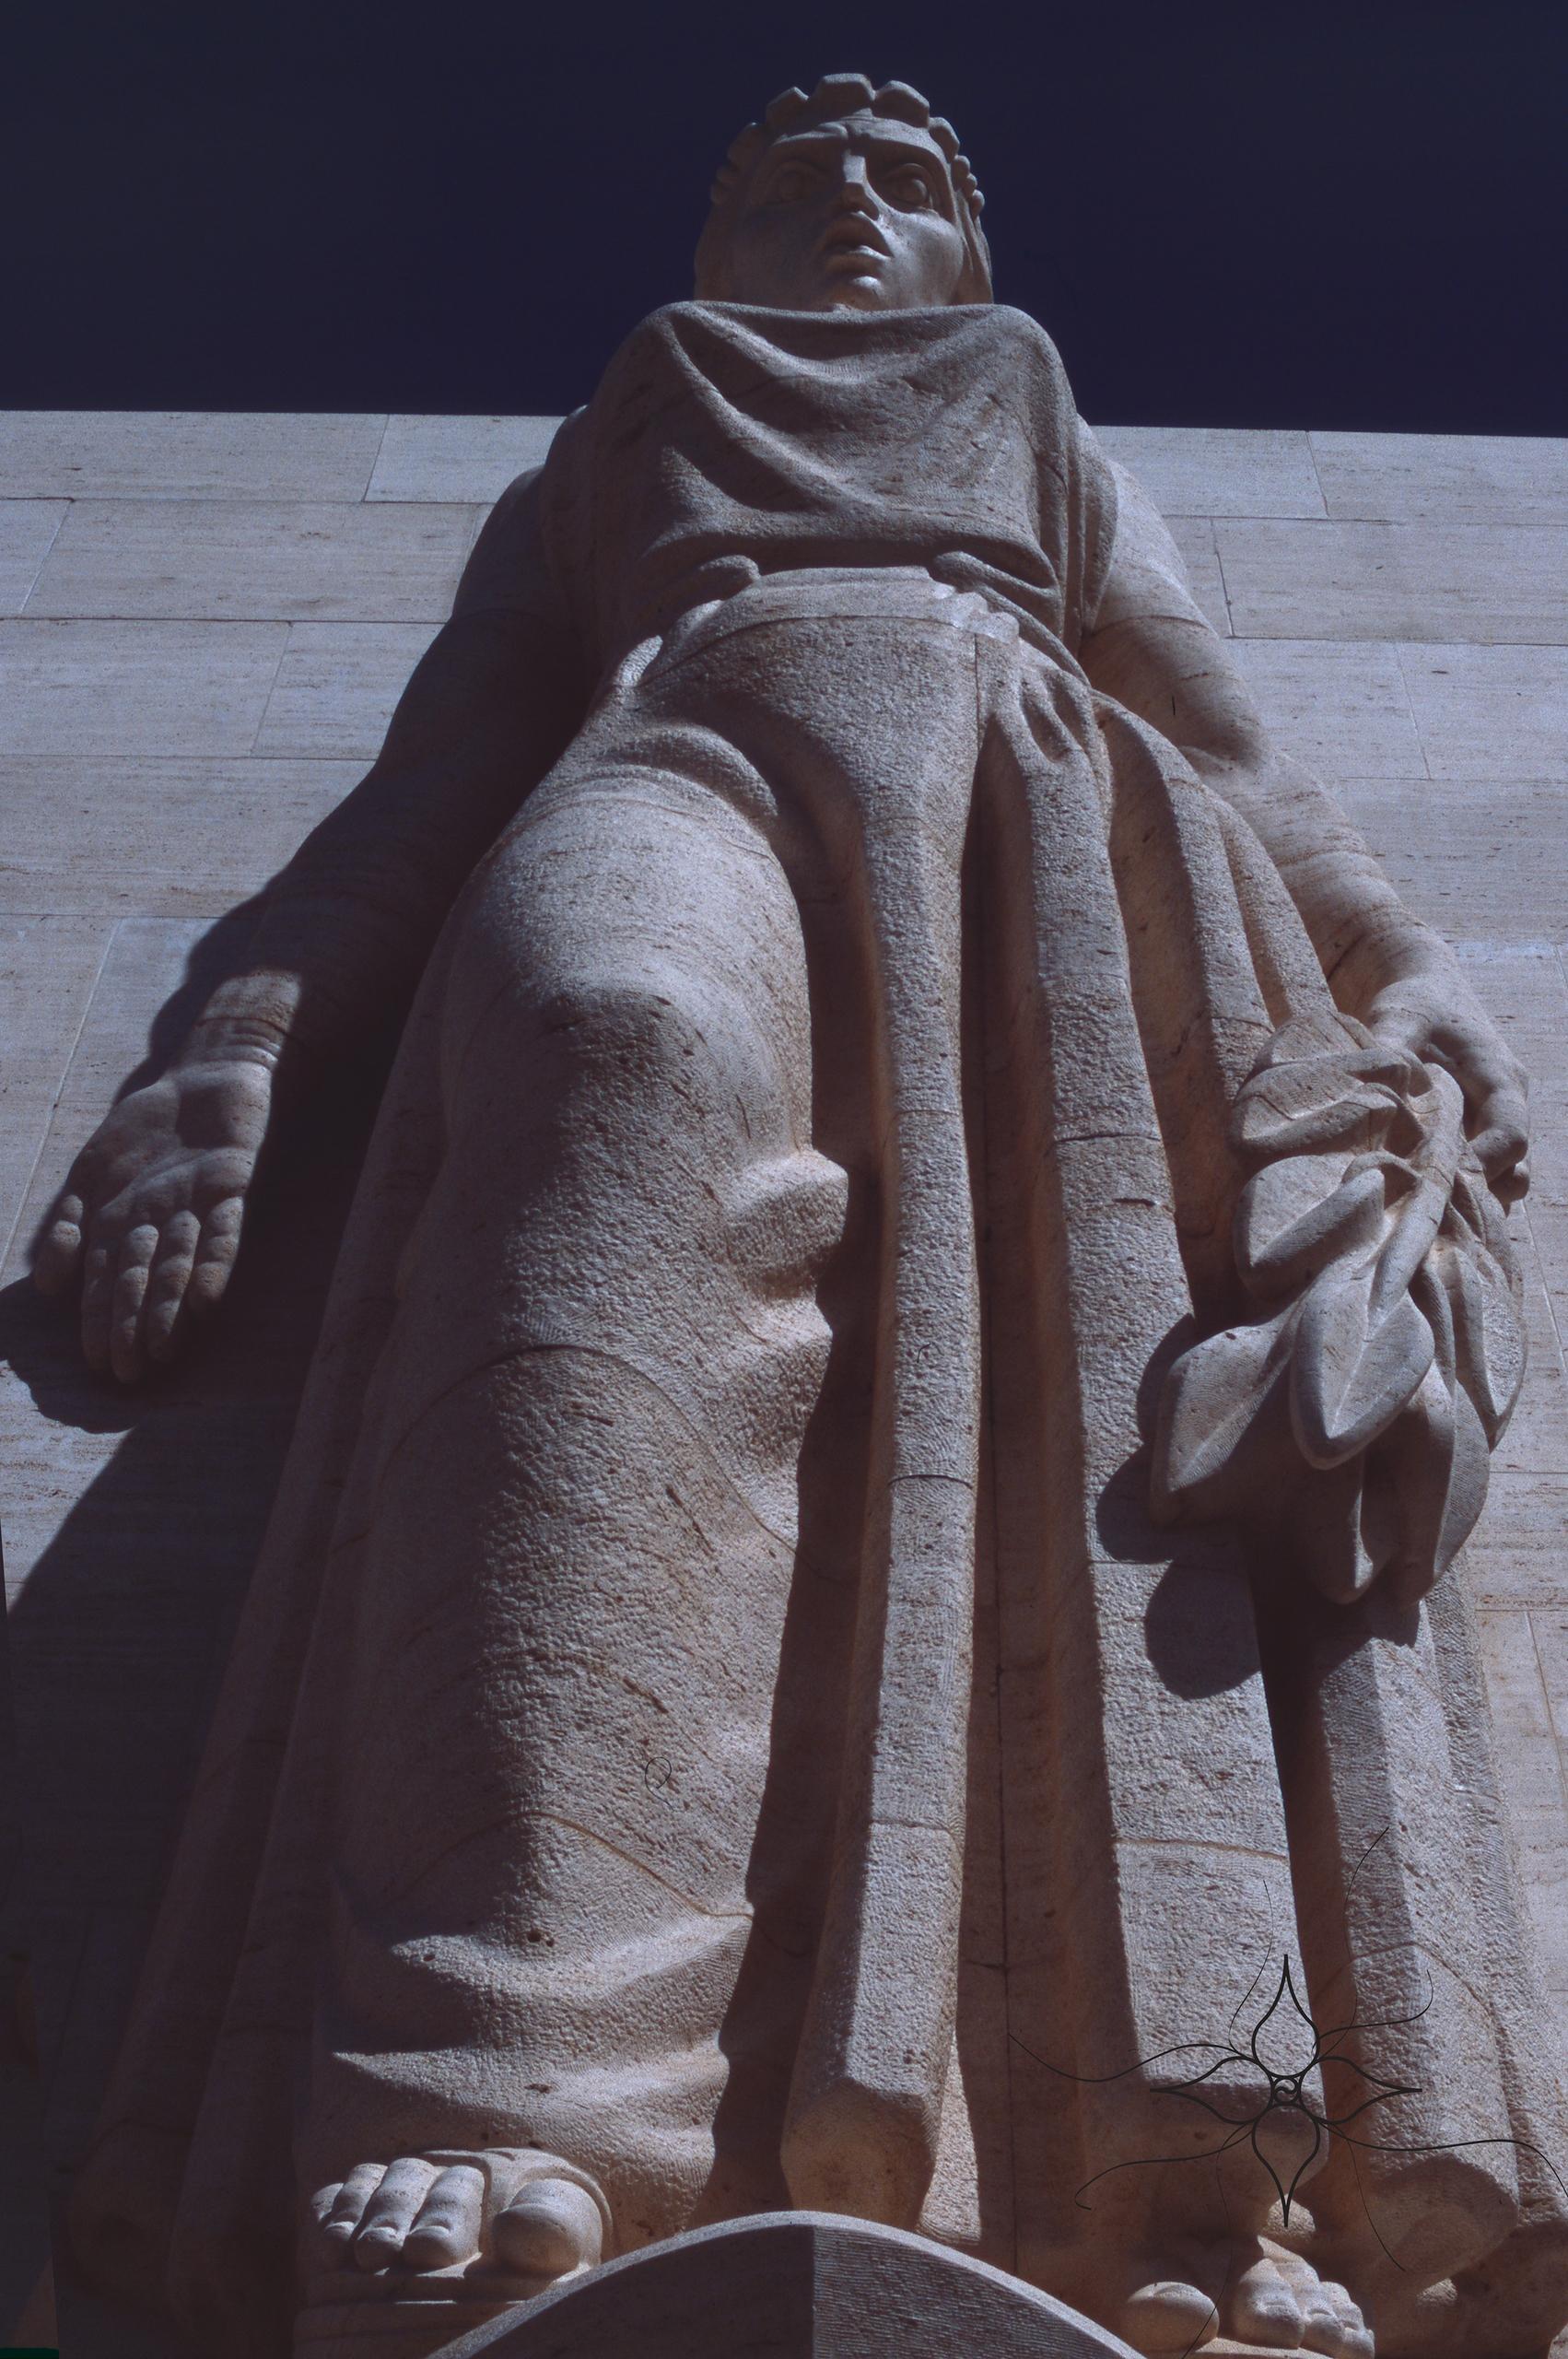 National Memorial Cemetery Paci - jasonbleecher | ello